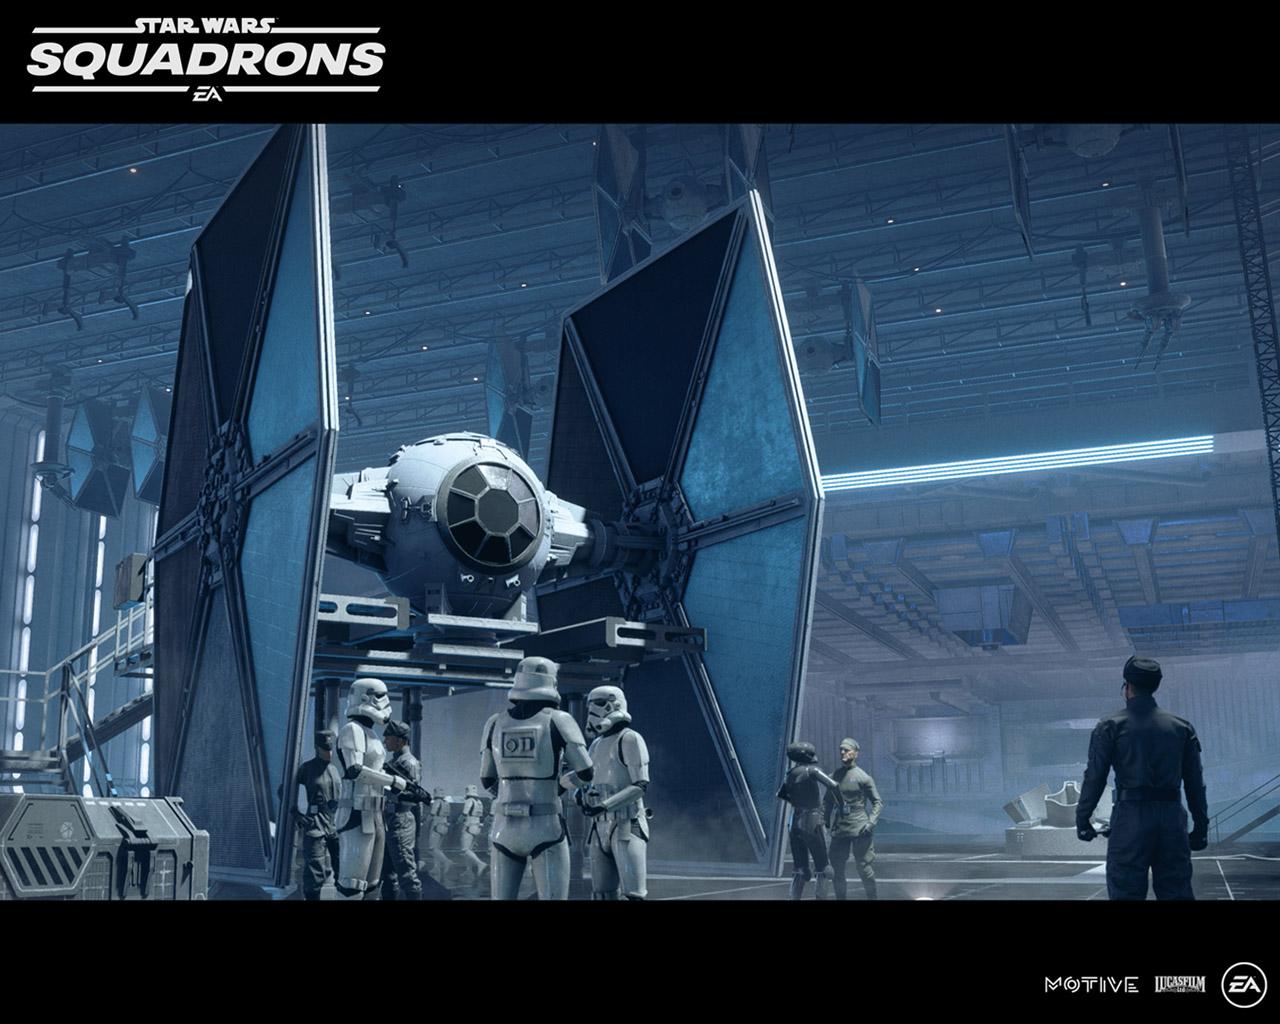 Free Star Wars: Squadrons Wallpaper in 1280x1024